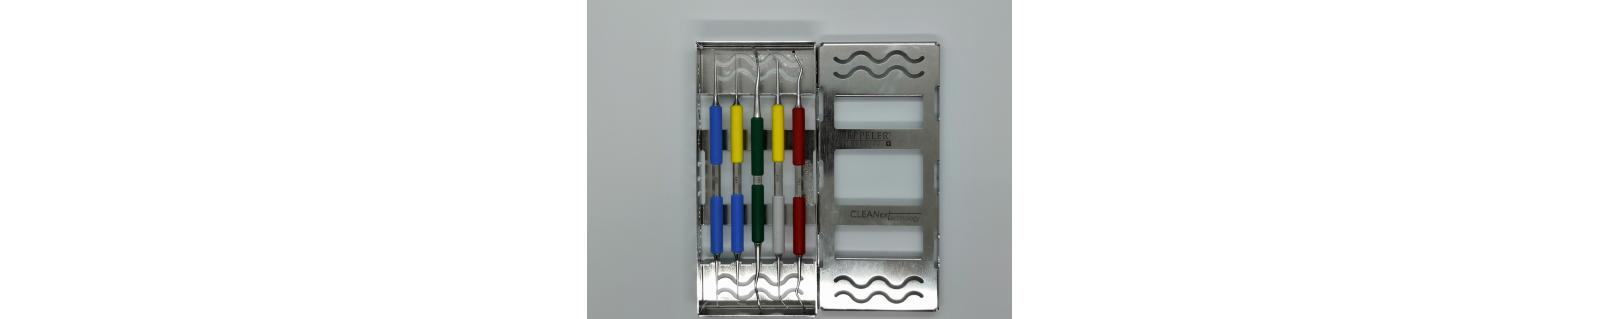 Kit de Micro Cirurgia Apical